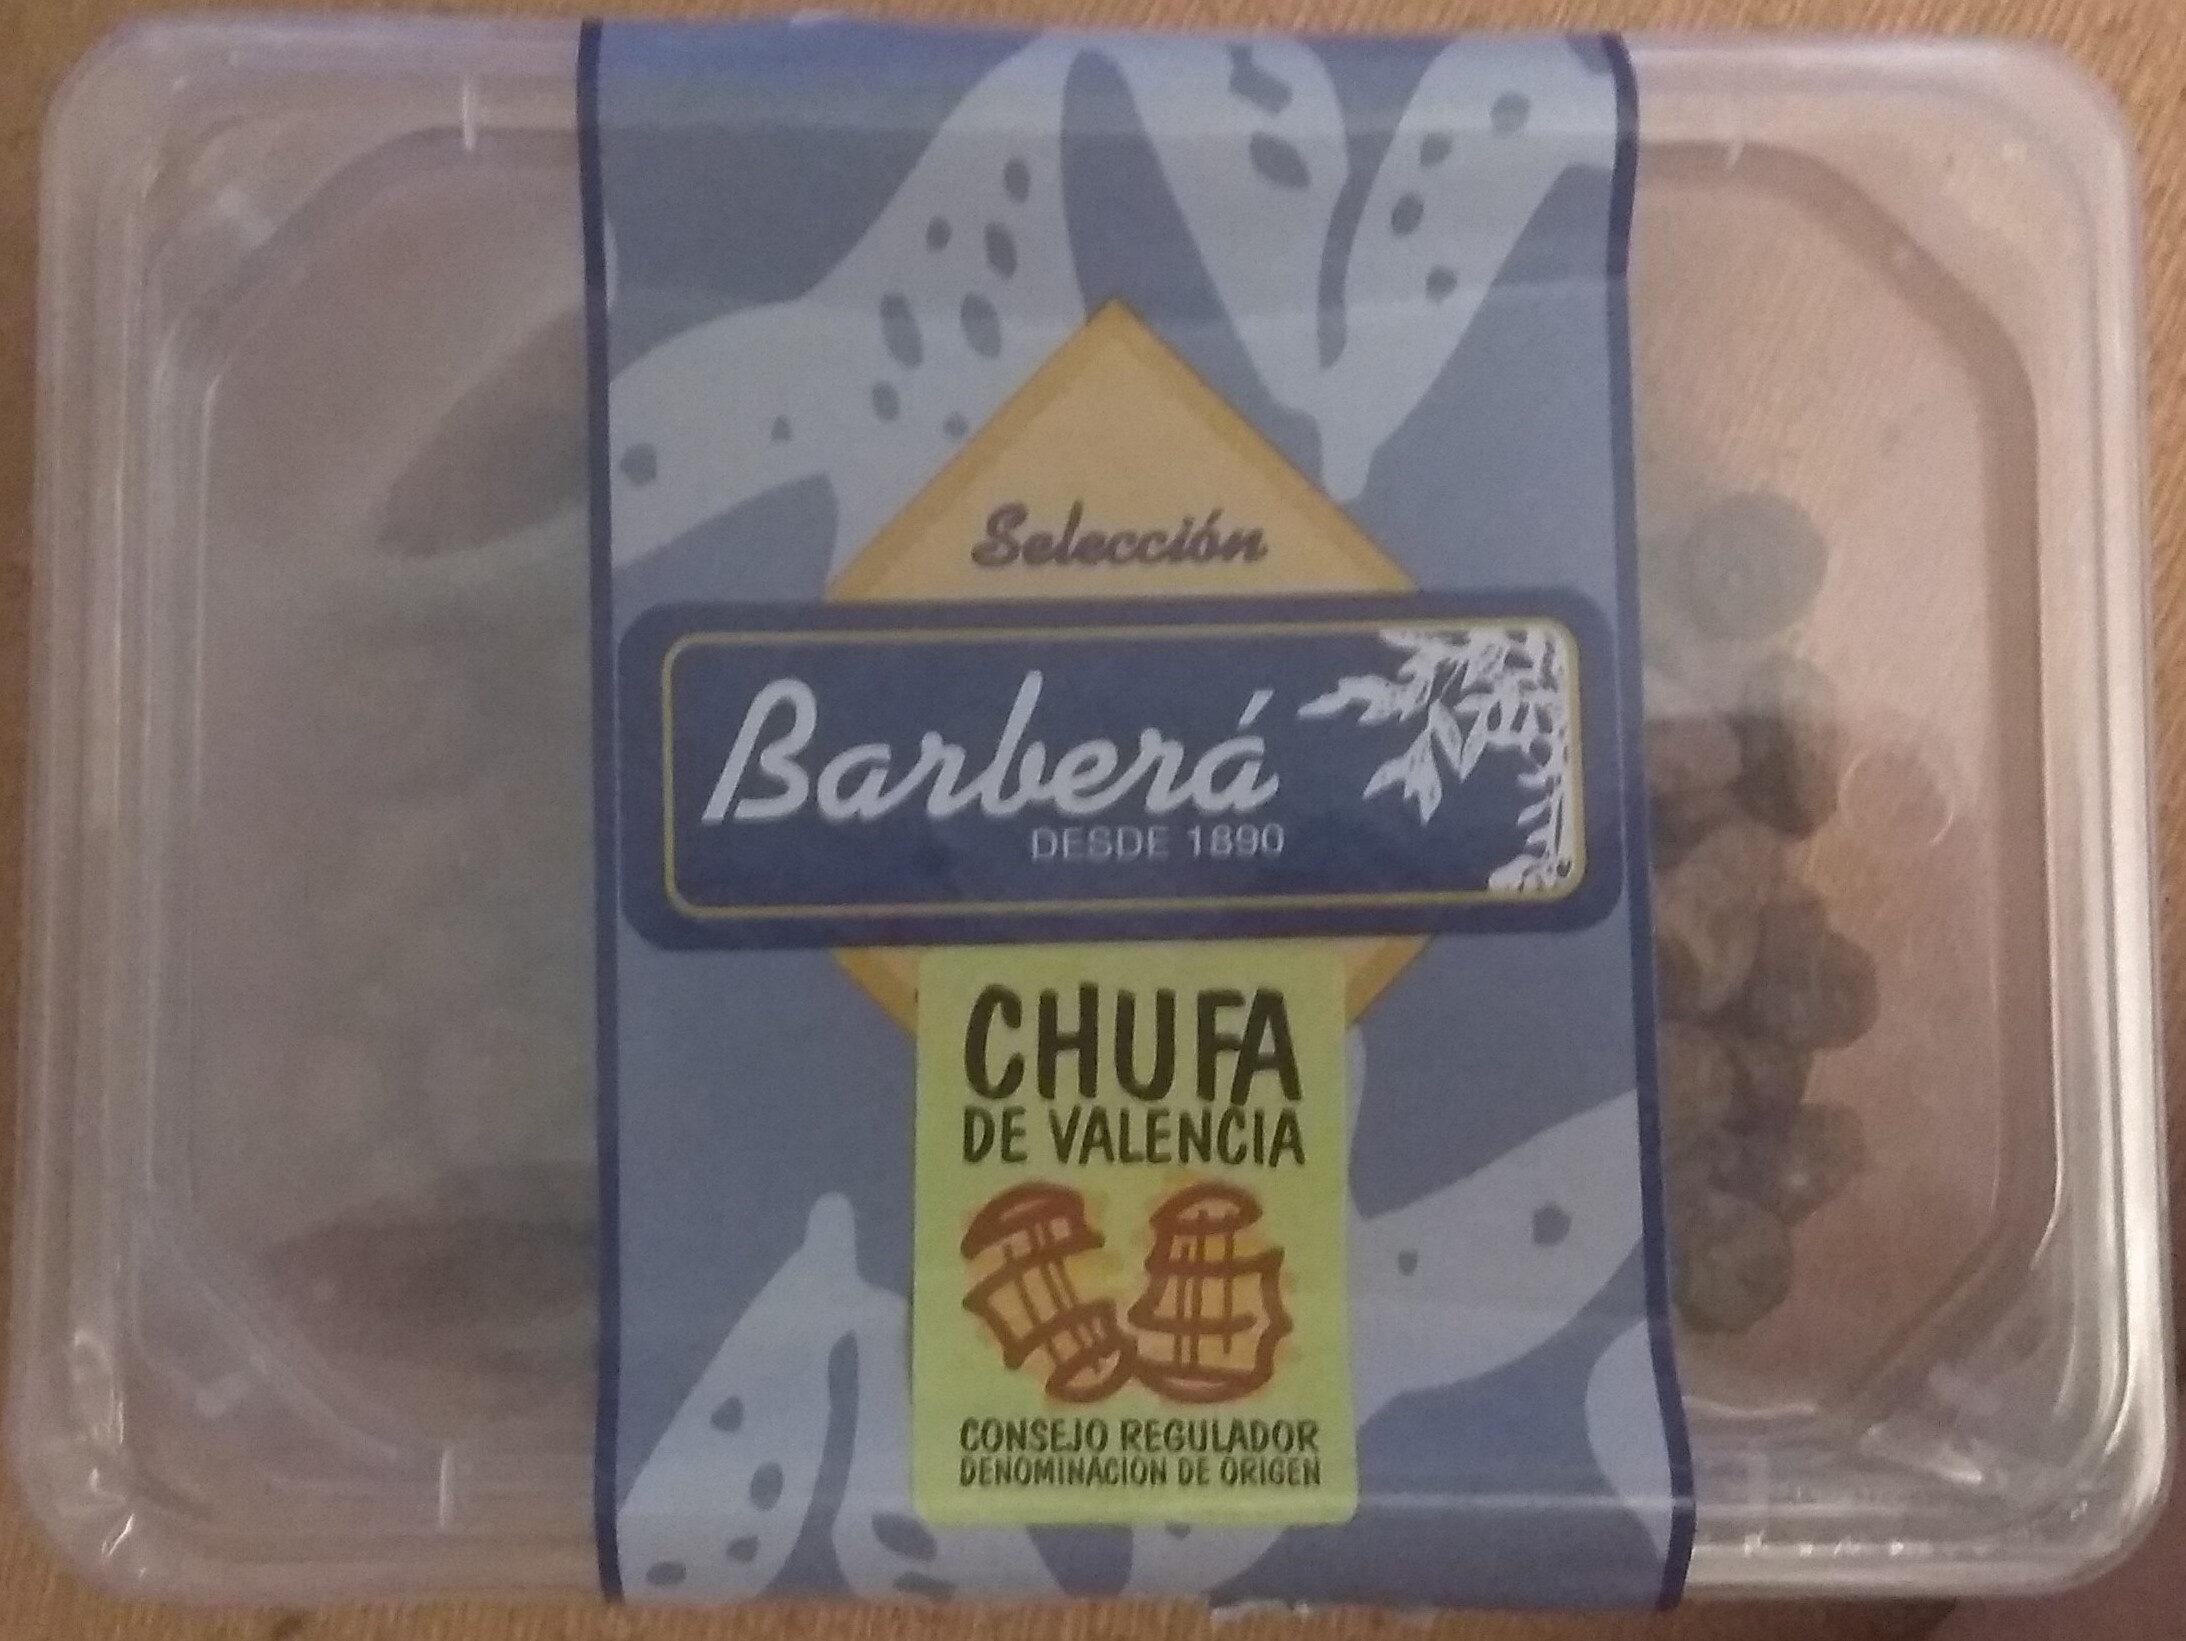 Chufas tarrina 250 g - Product